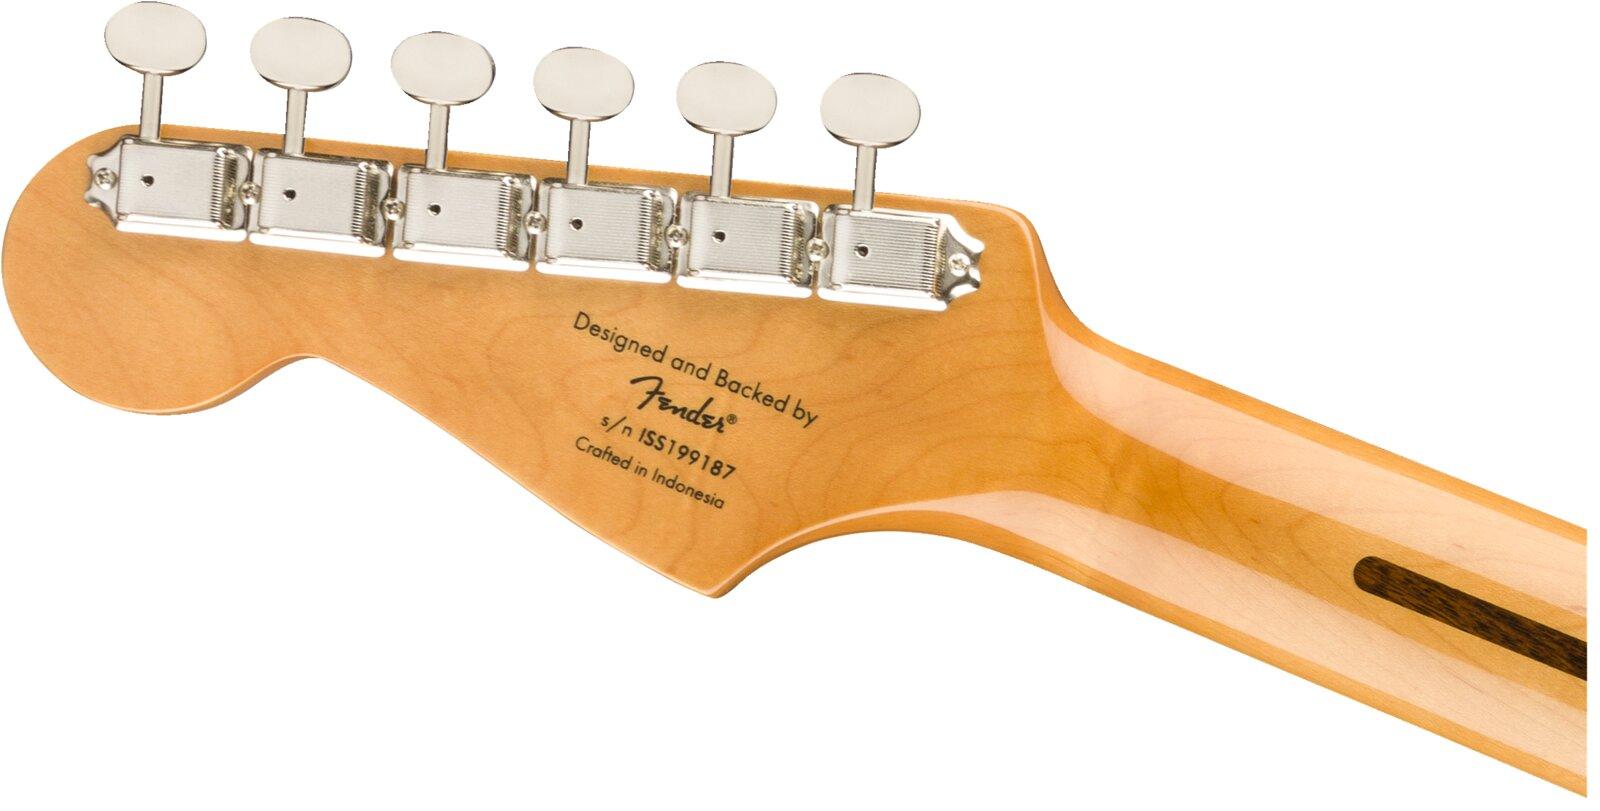 Squier Classic Vibe '50s Stratocaster Maple Fingerboard Black : photo 5